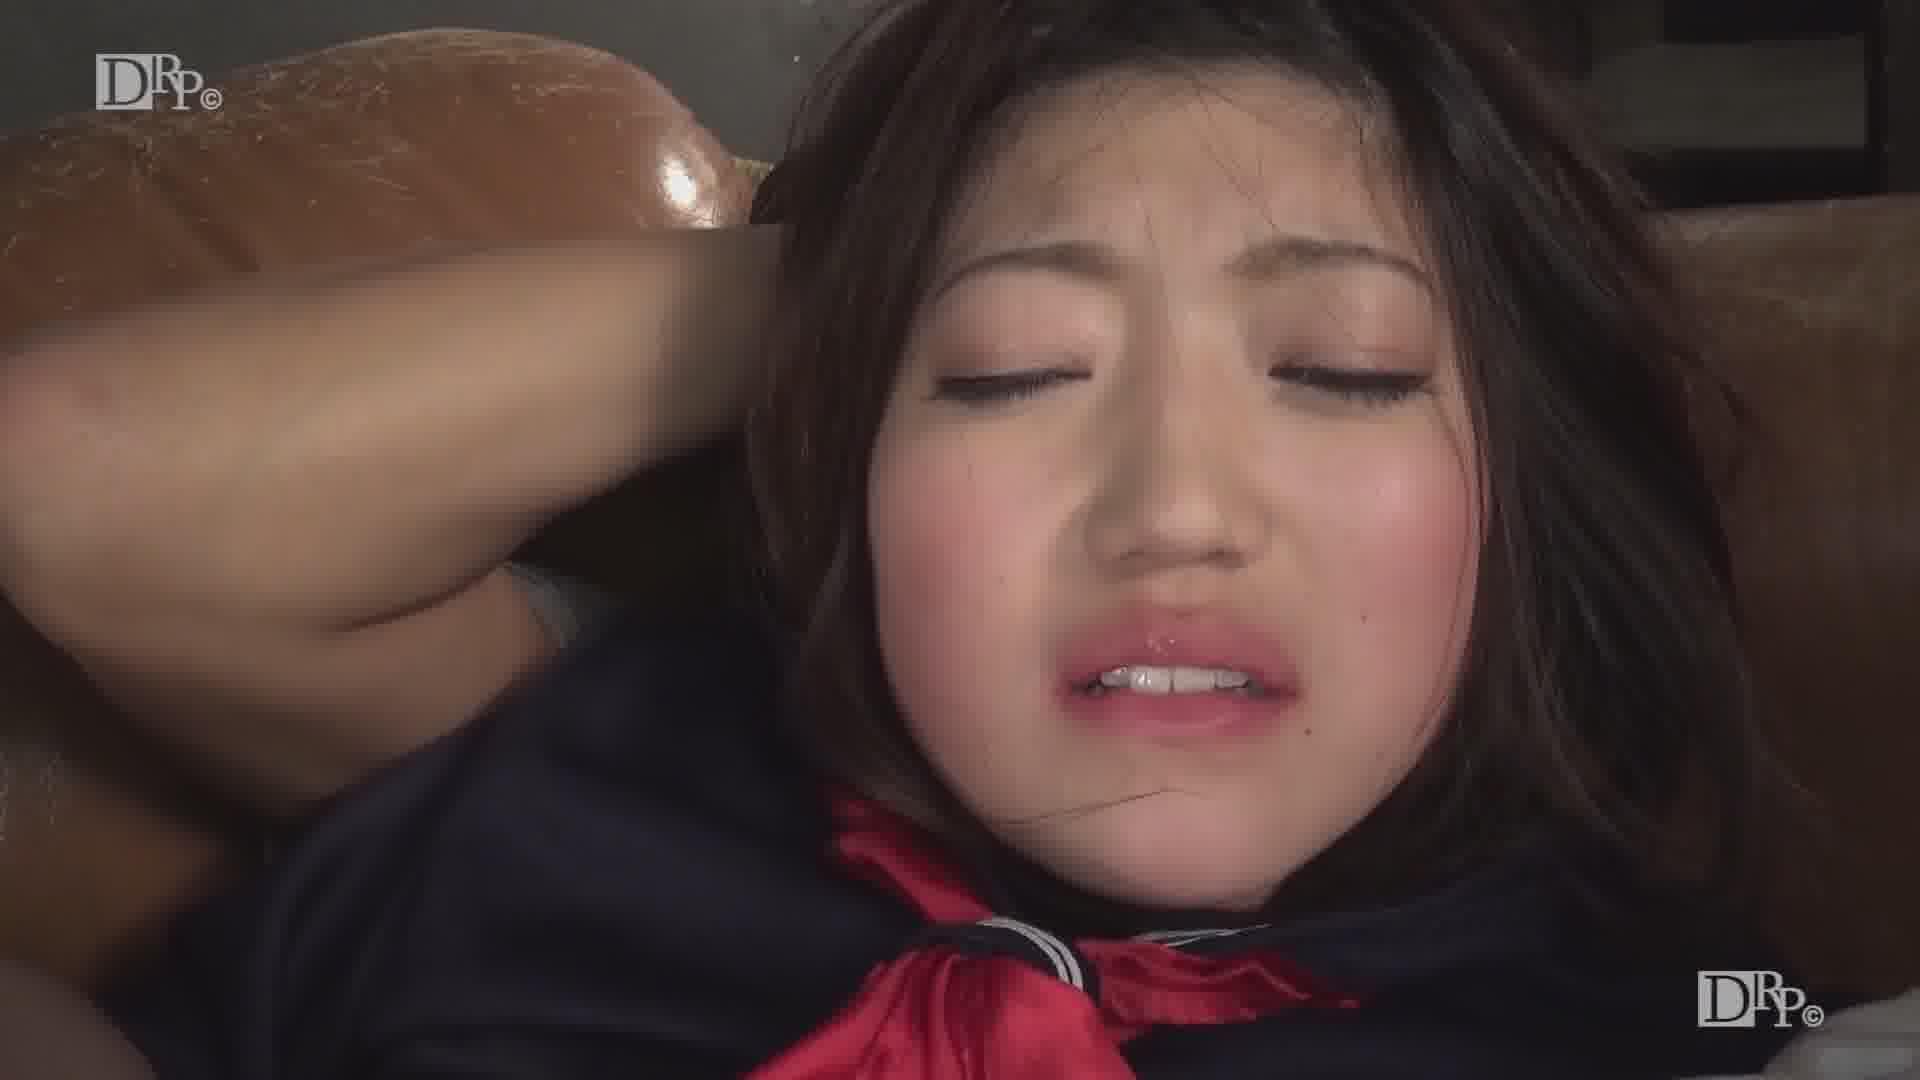 制服美女倶楽部 Vol.21 - 南星愛【制服・パイパン・3P】